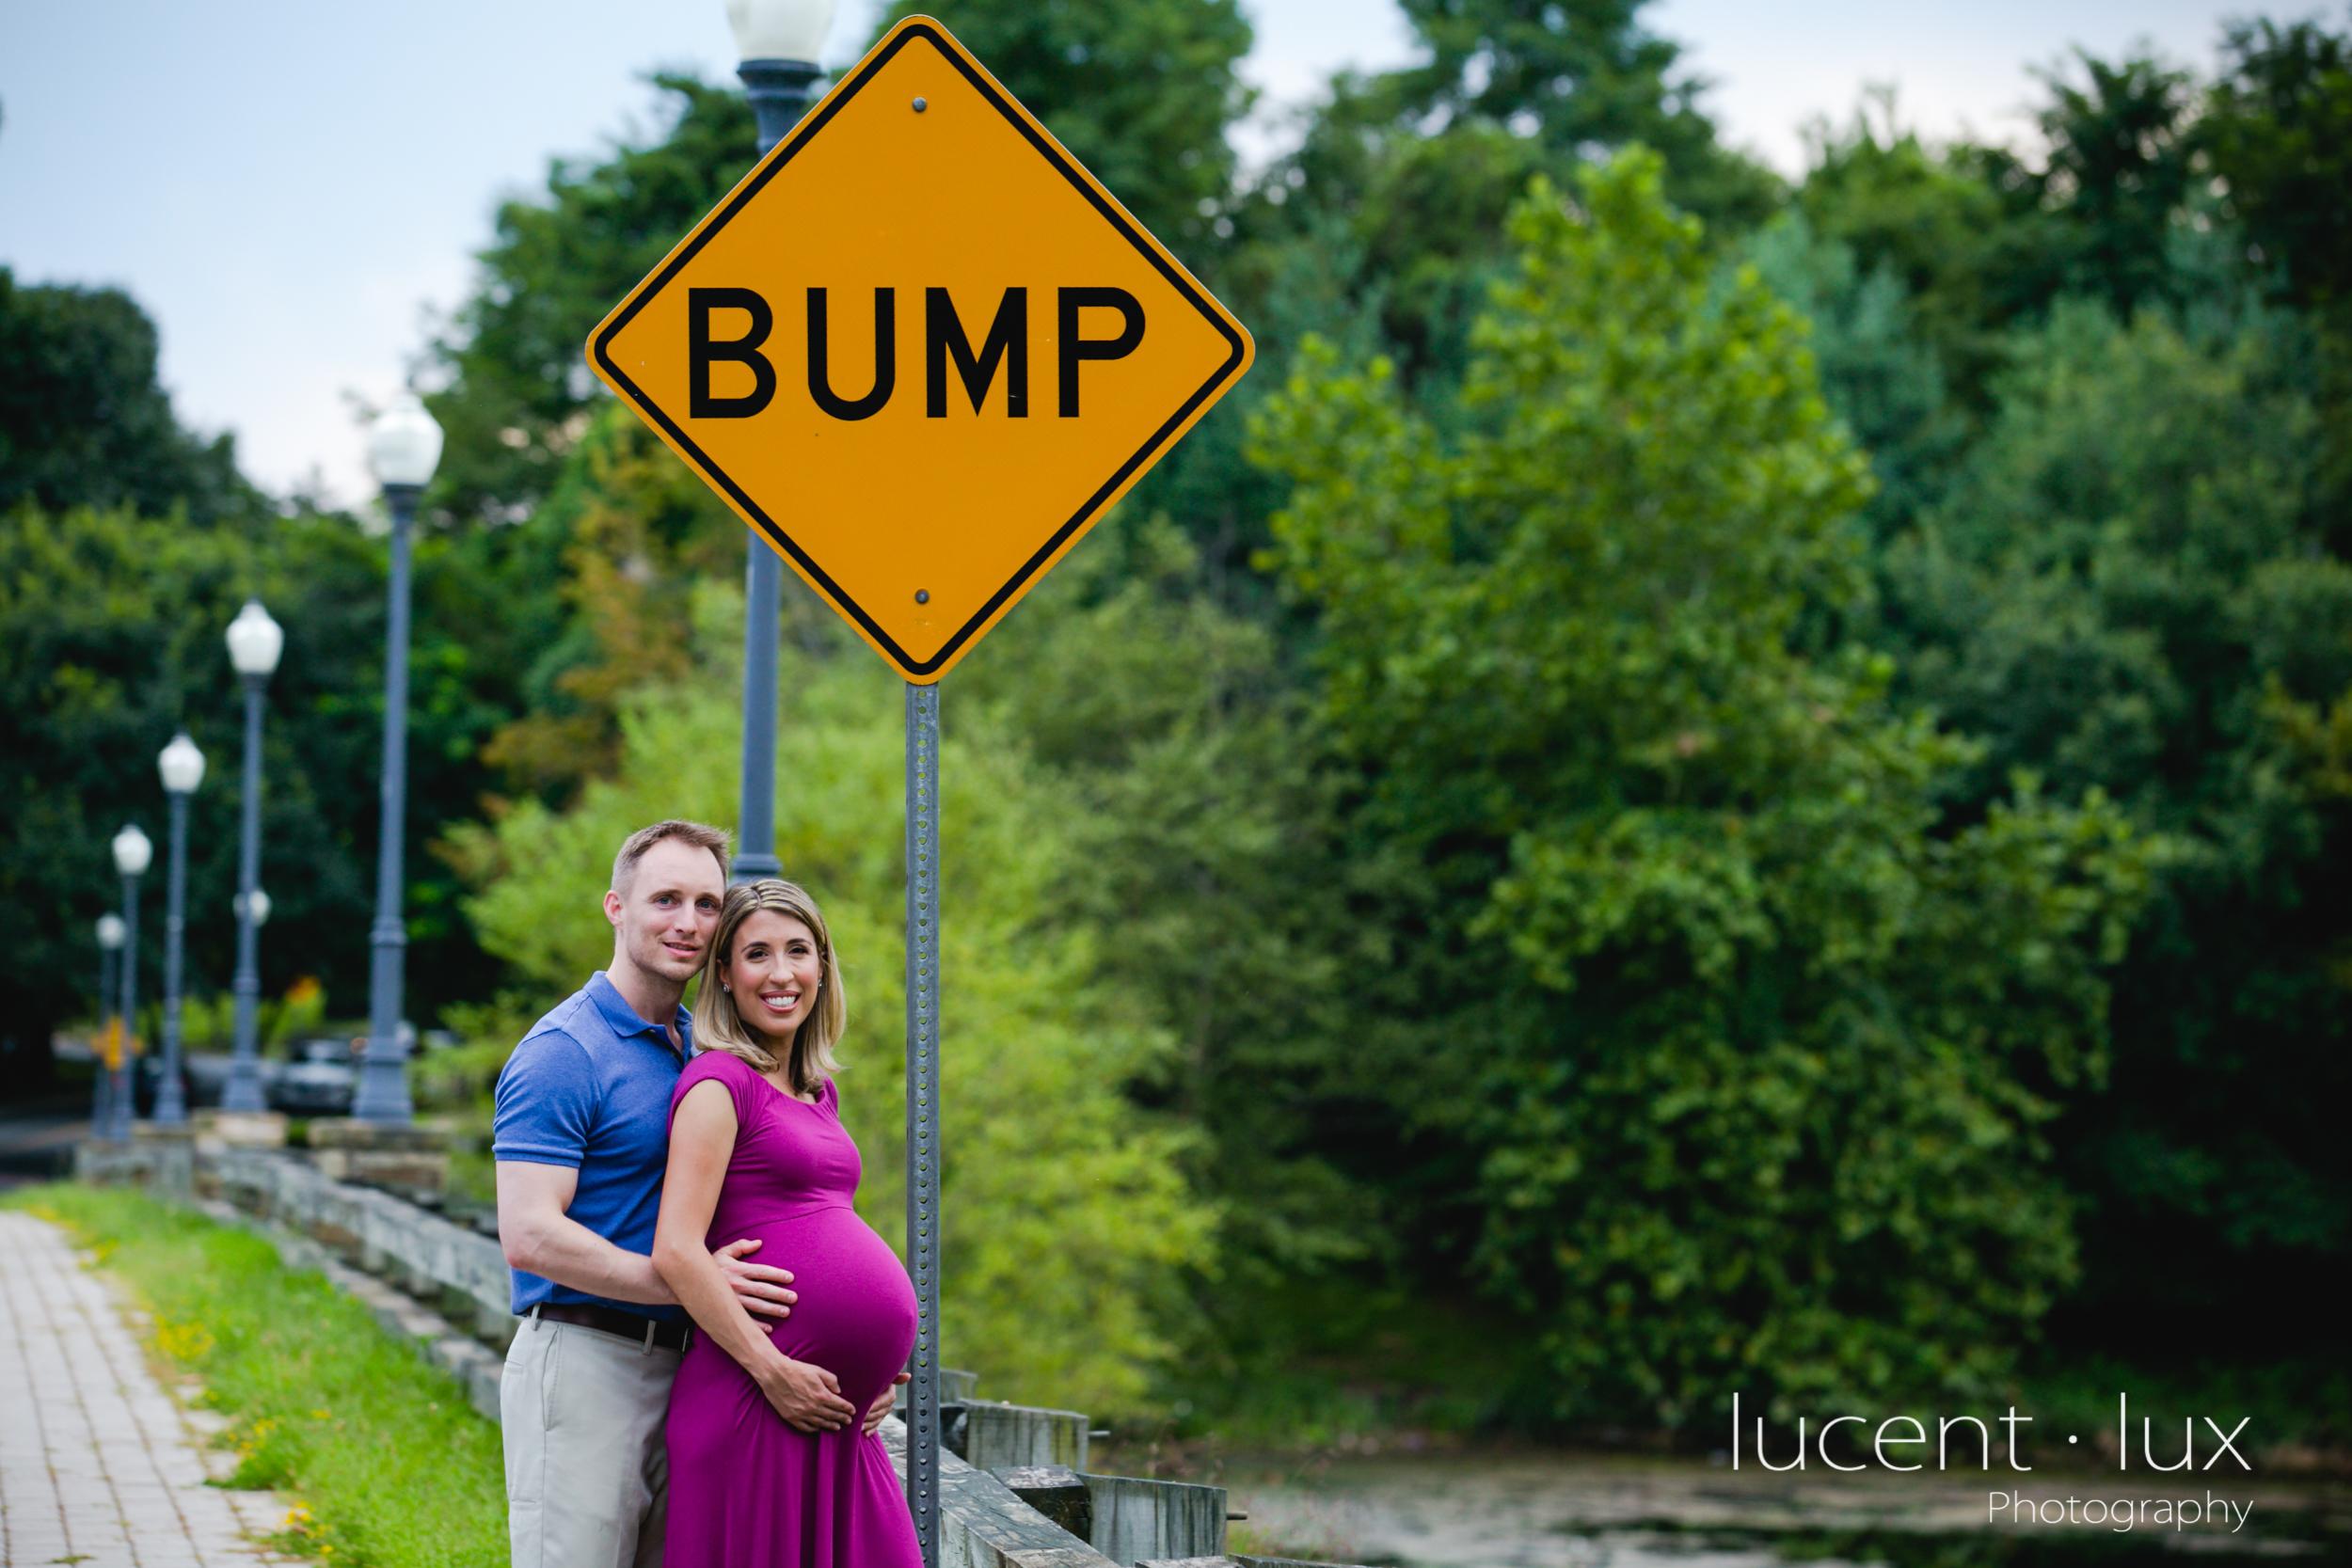 Maternity-Photography-Maryland-Baltimore-Photographer-Family-Portraits-Couple-Engagement-Newborn-205.jpg